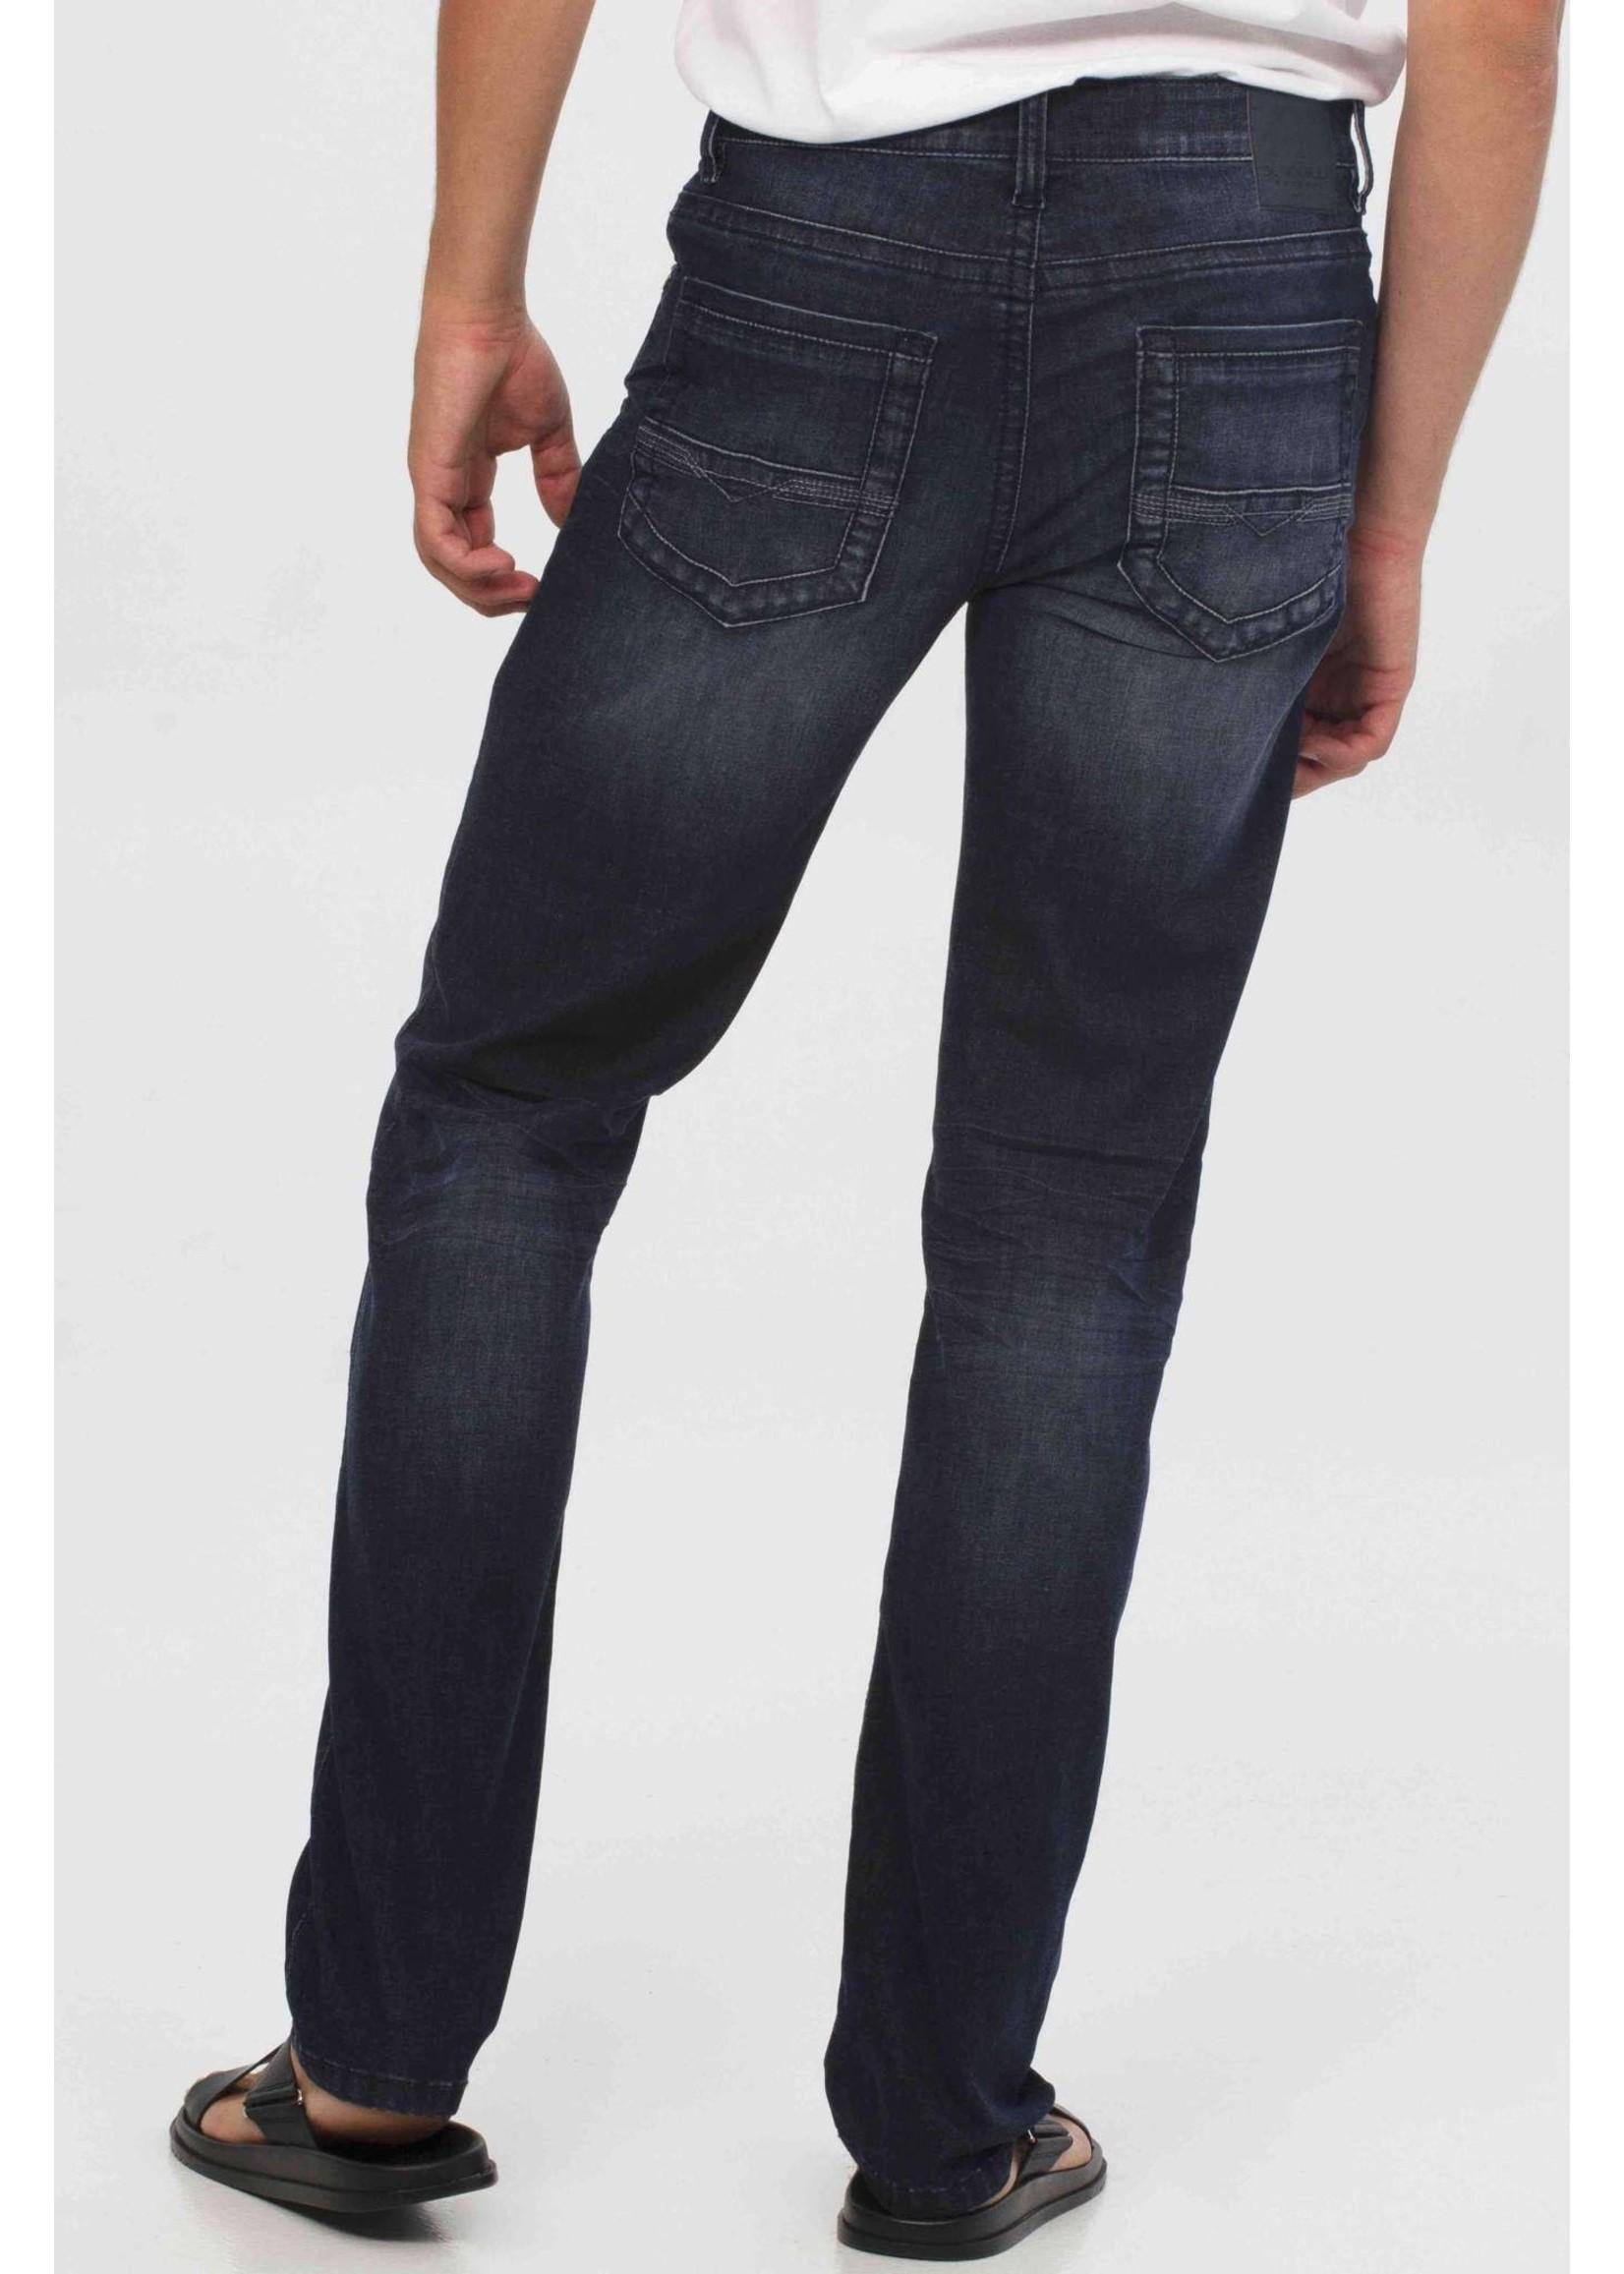 Black Bull Apparel Black Bull Apparel Jeans - Mad